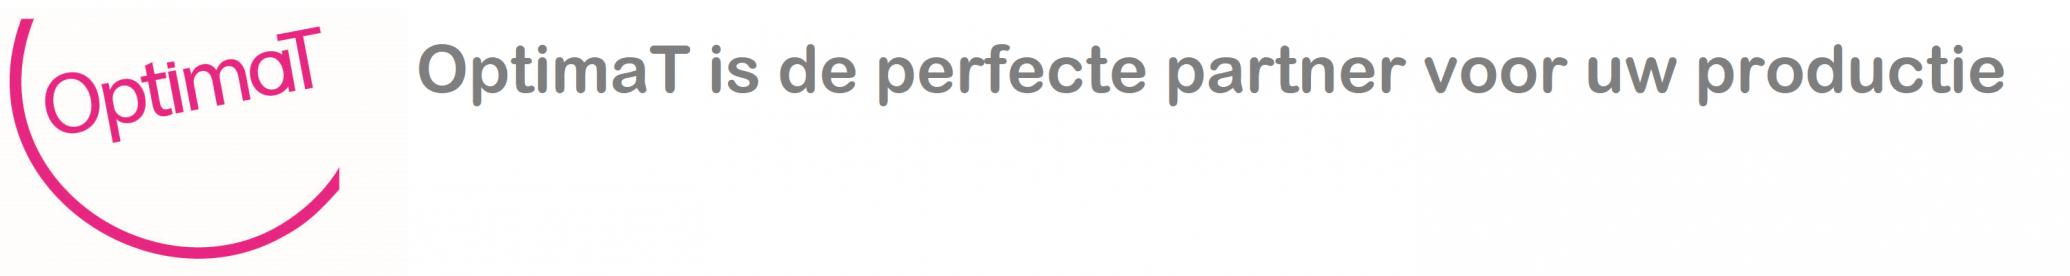 optimat-header - groot - groot logo.png